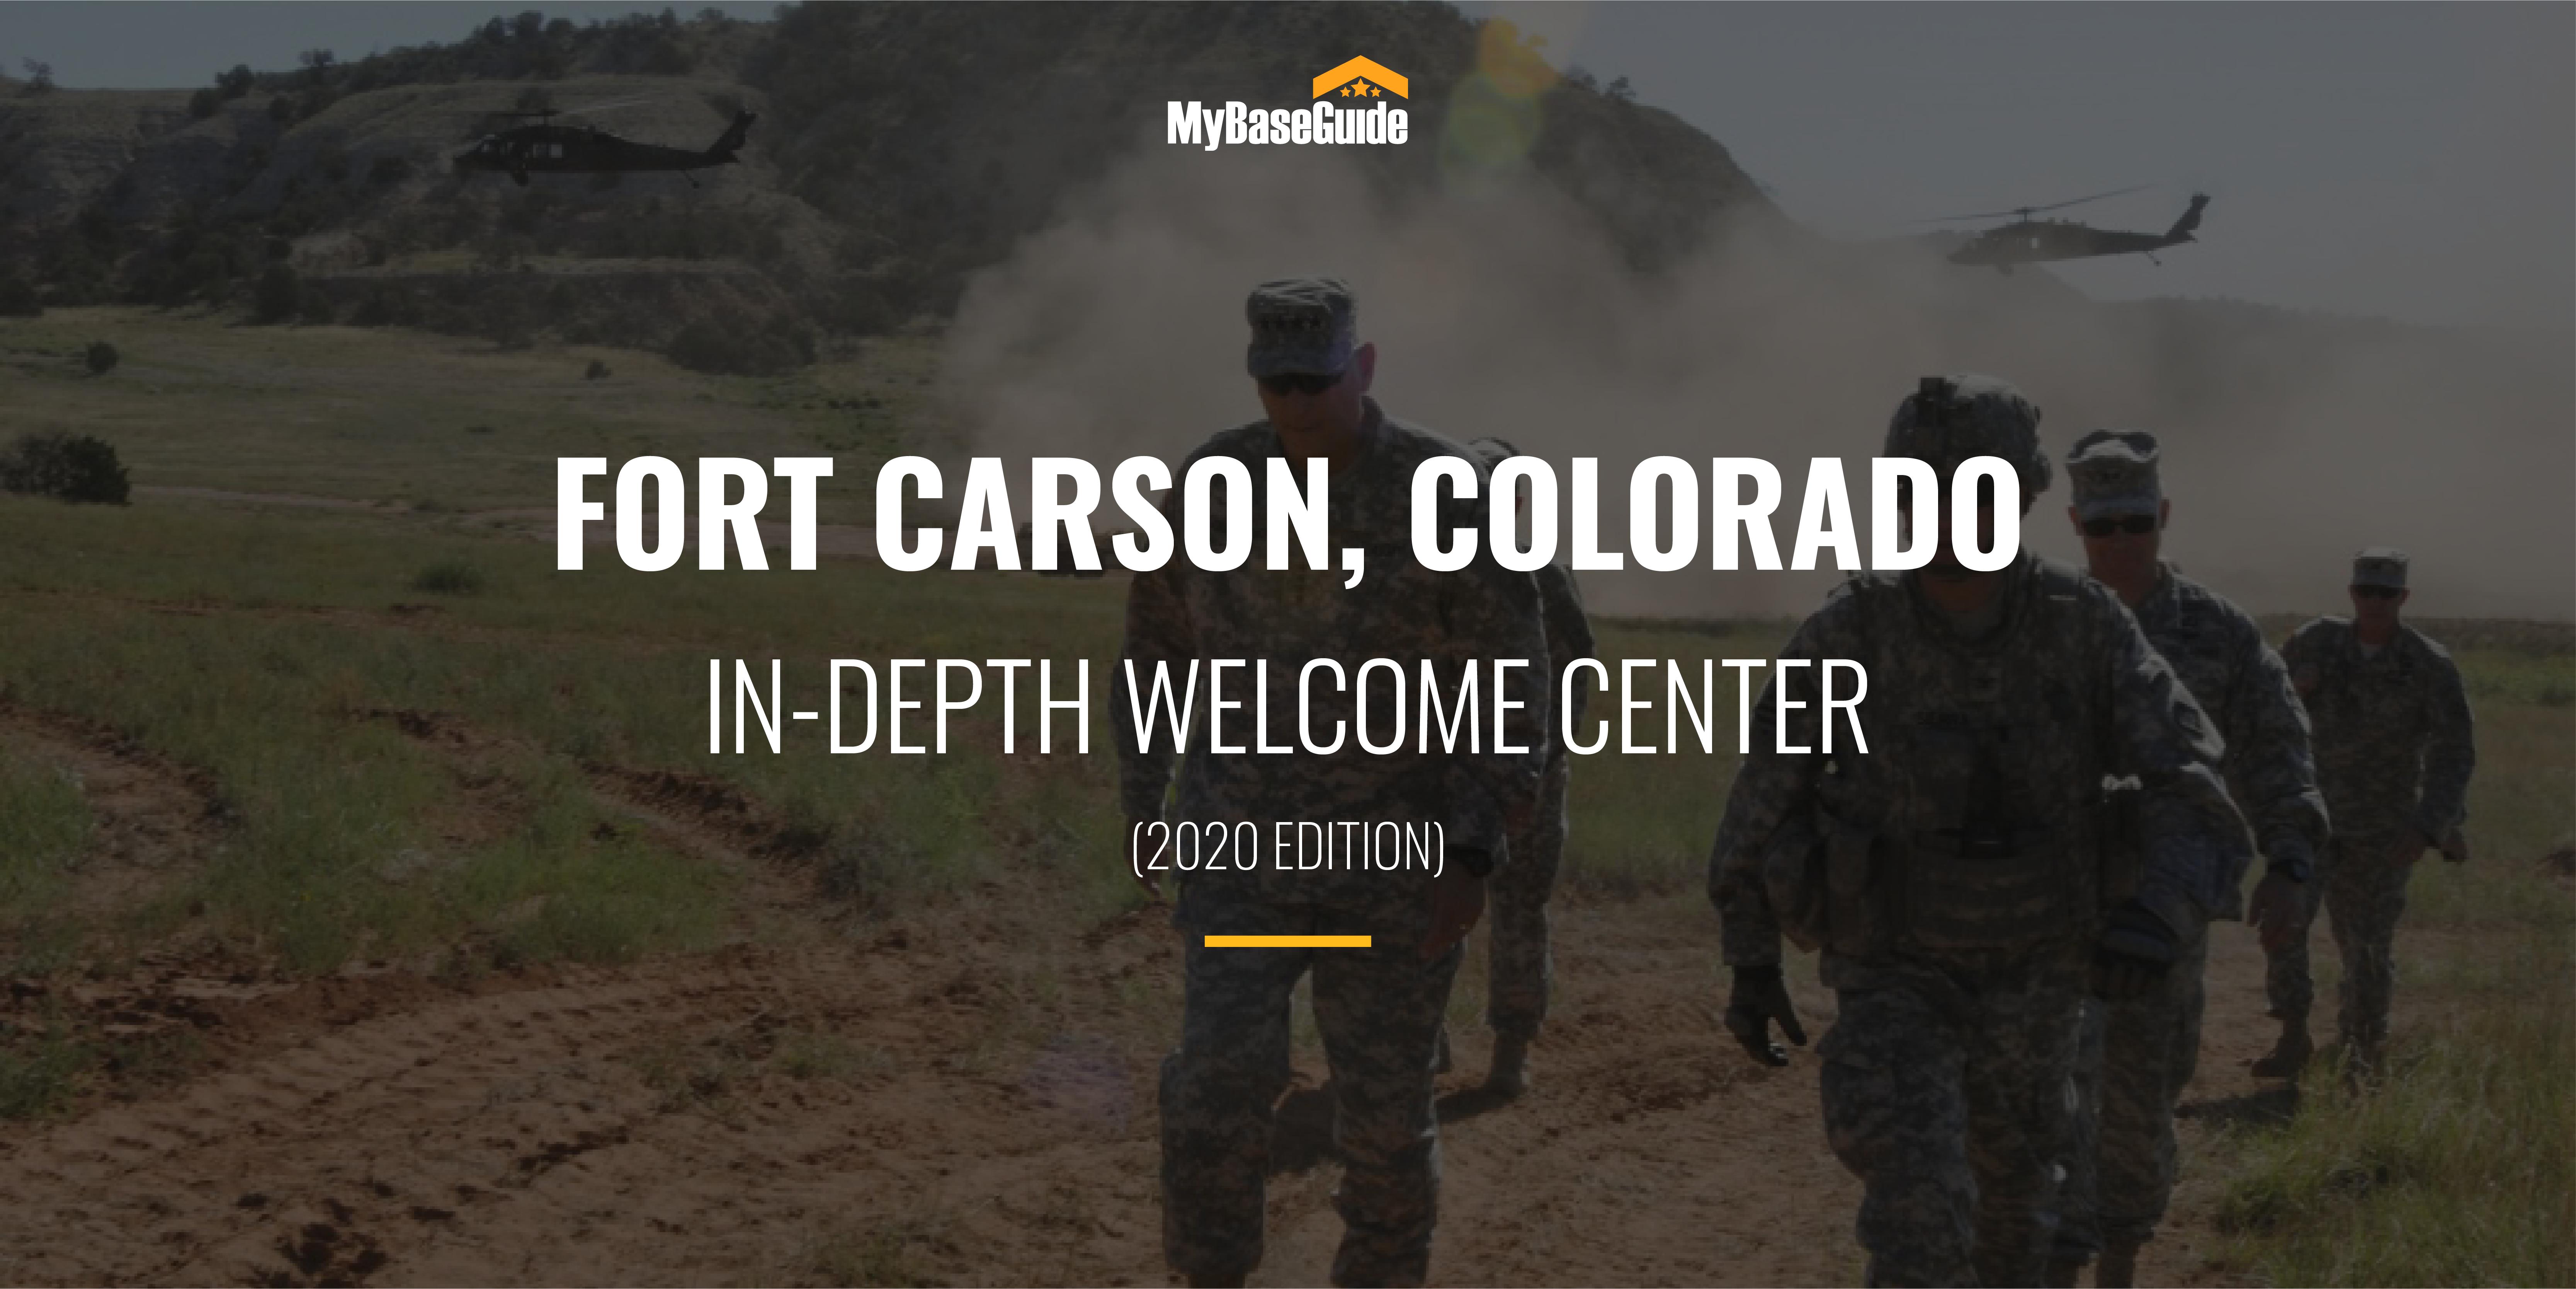 Fort Carson Colorado